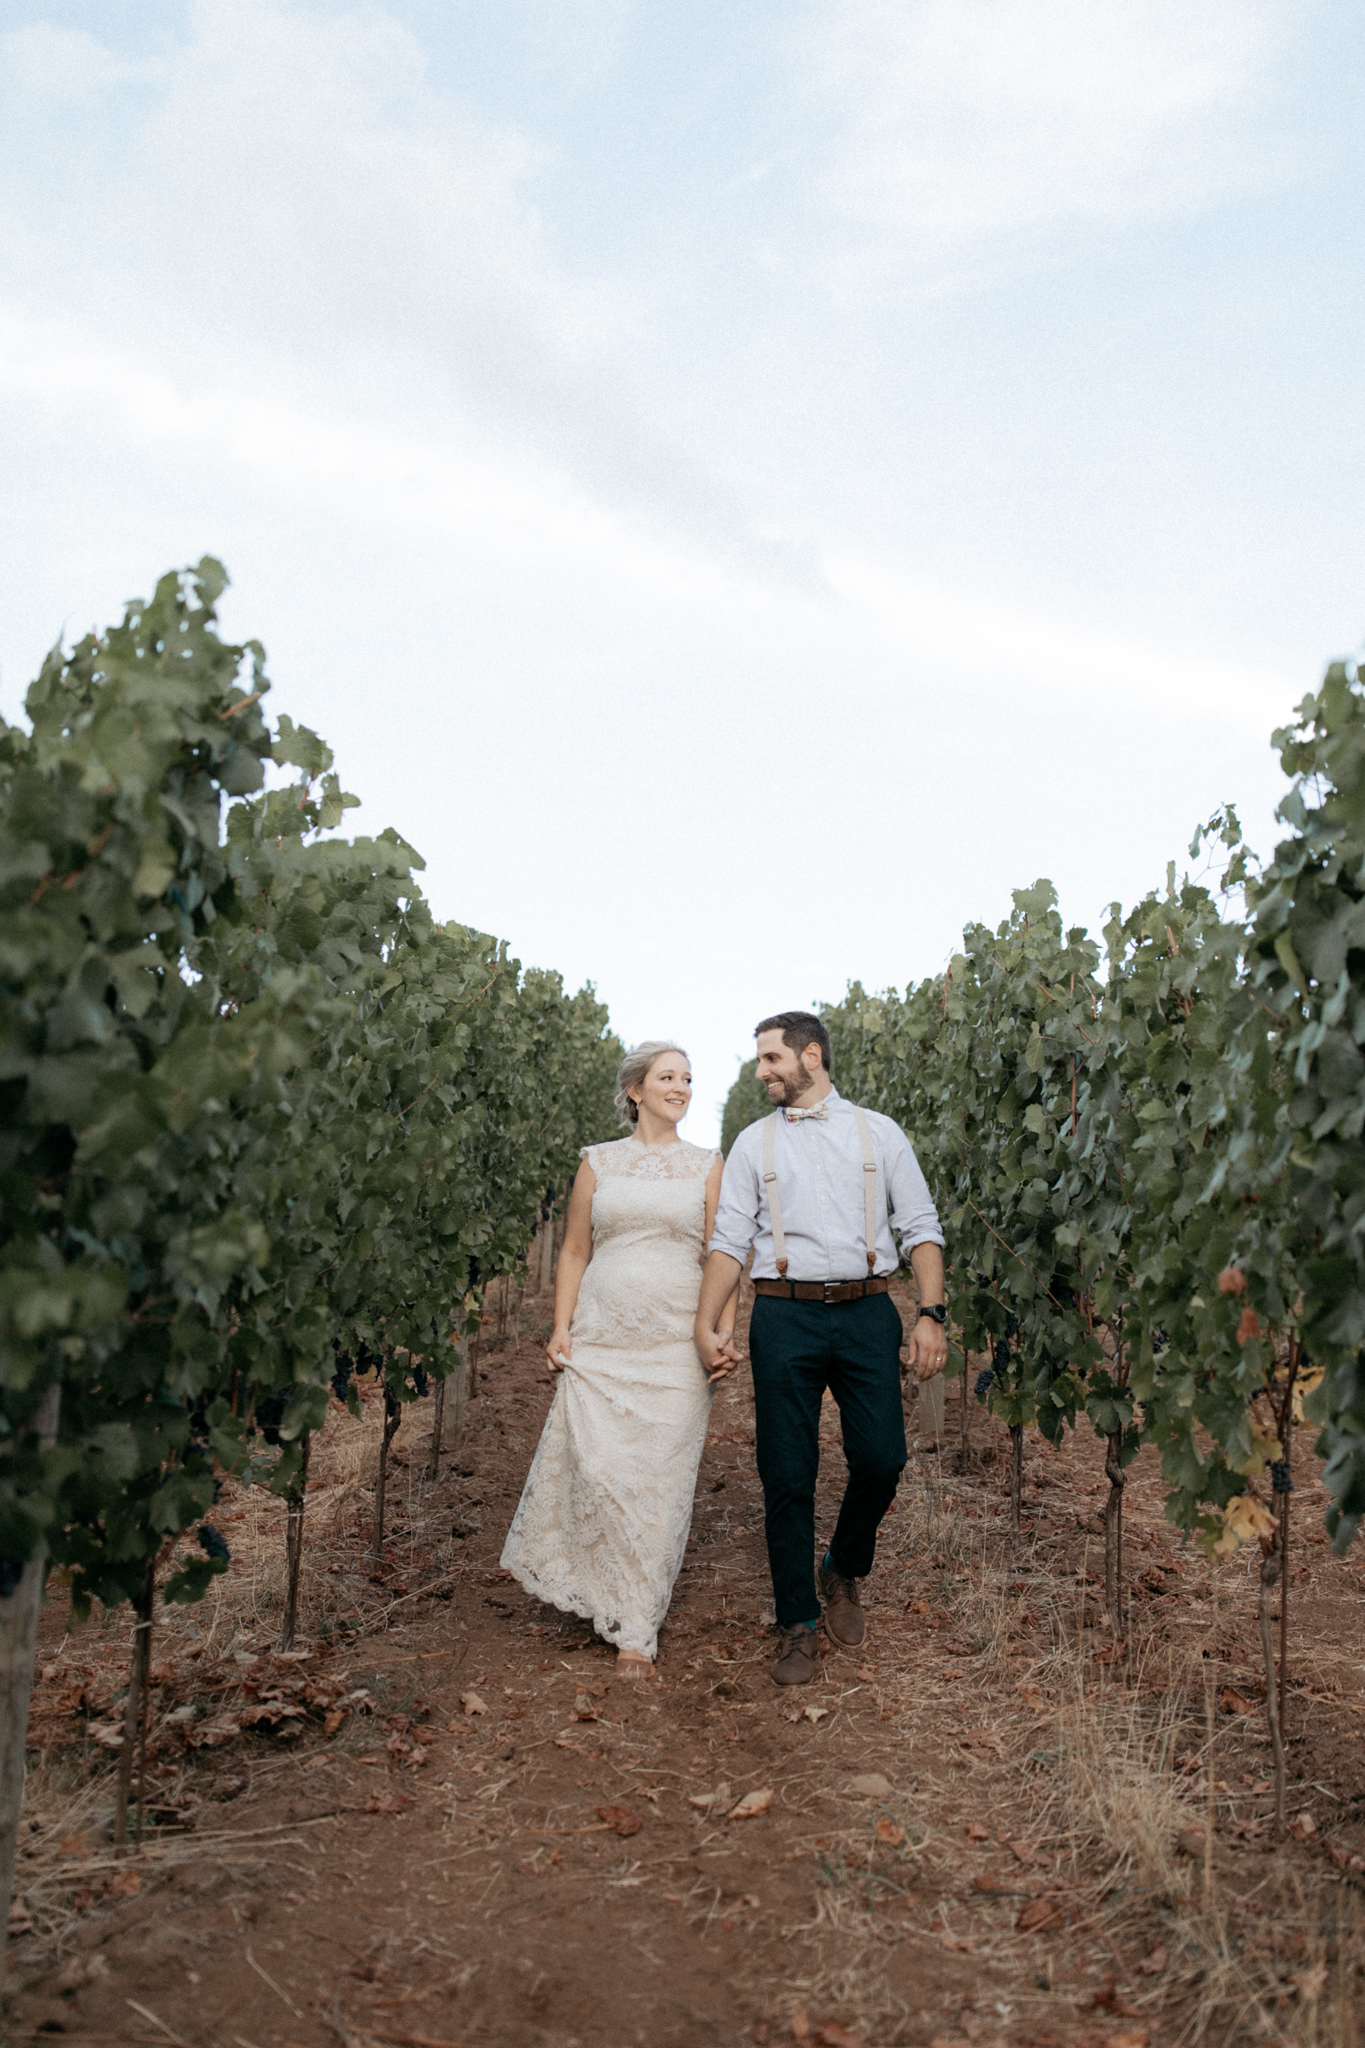 Summer wedding at Tumwater vineyard in Oregon's wine country